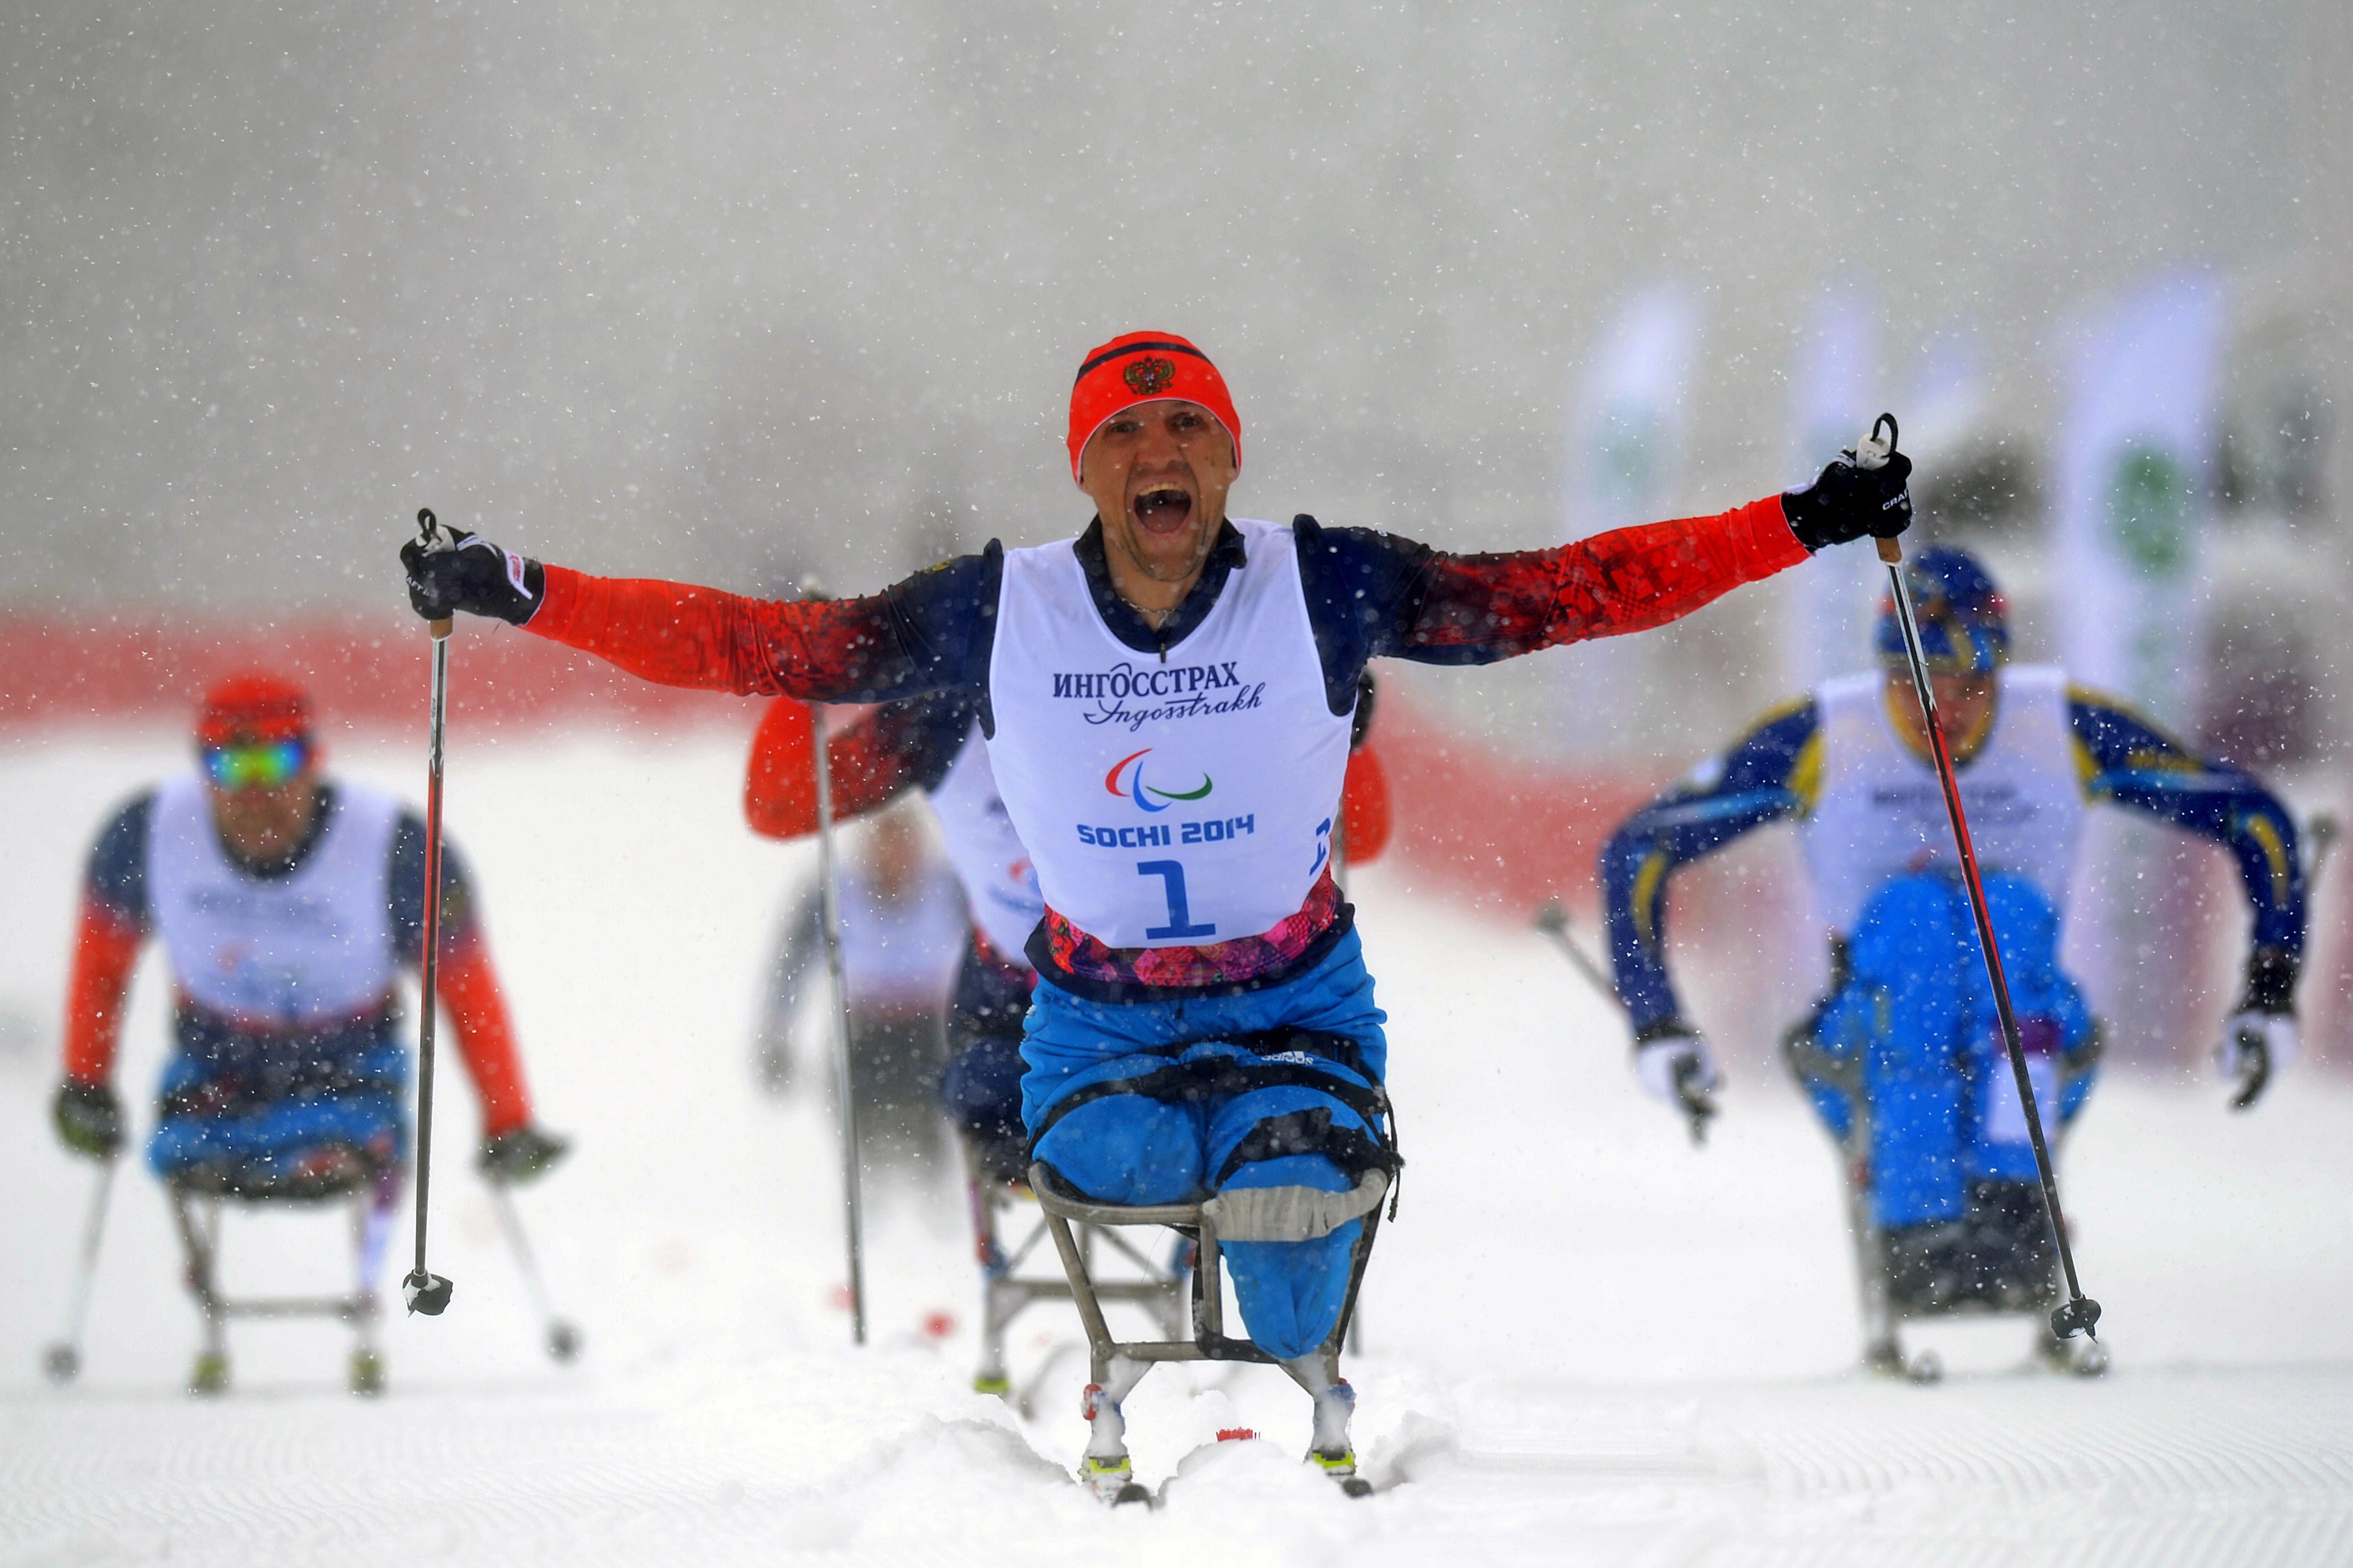 meet the paralympics in sochi